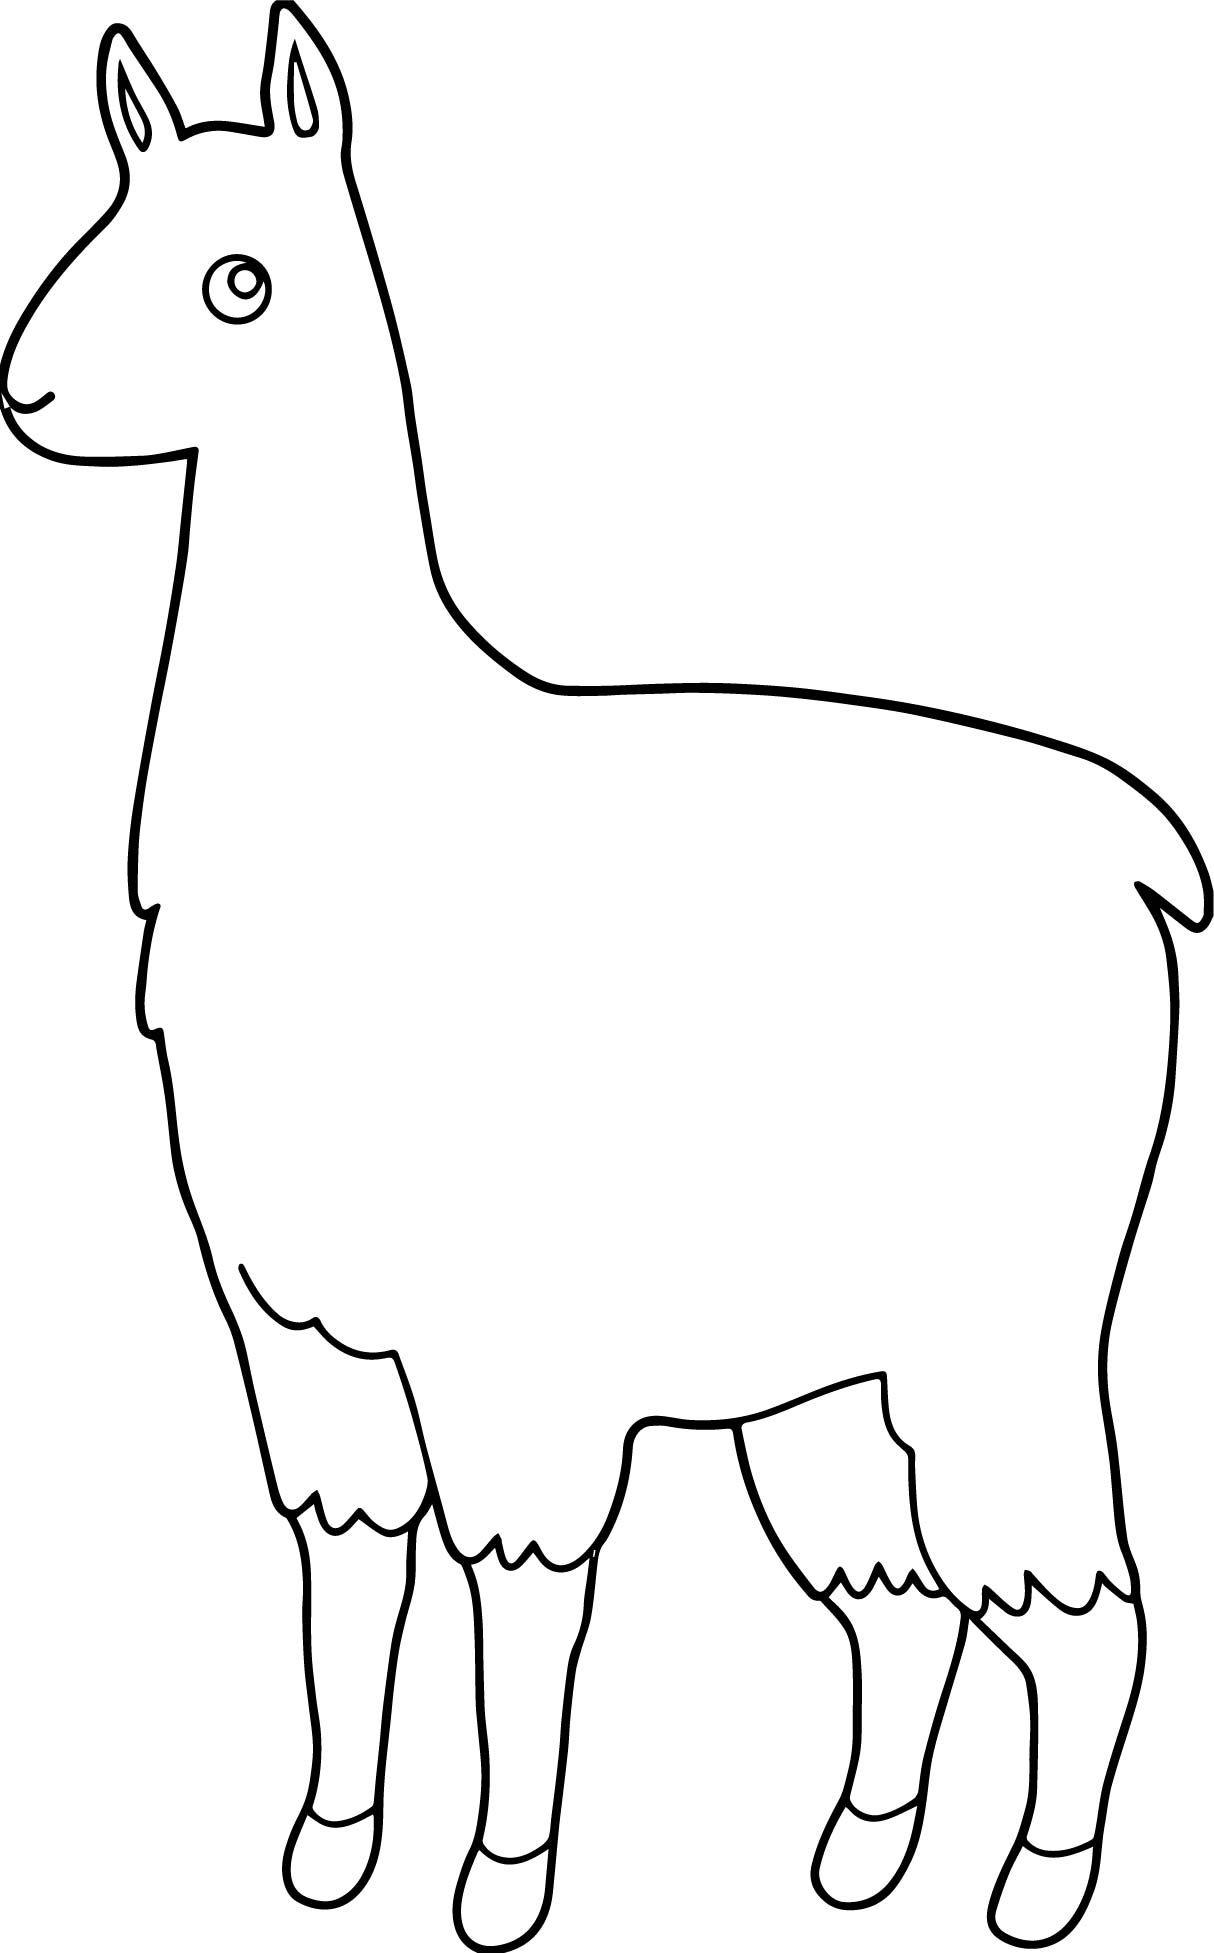 alpaca printable template  alpaca drawing coloring pages